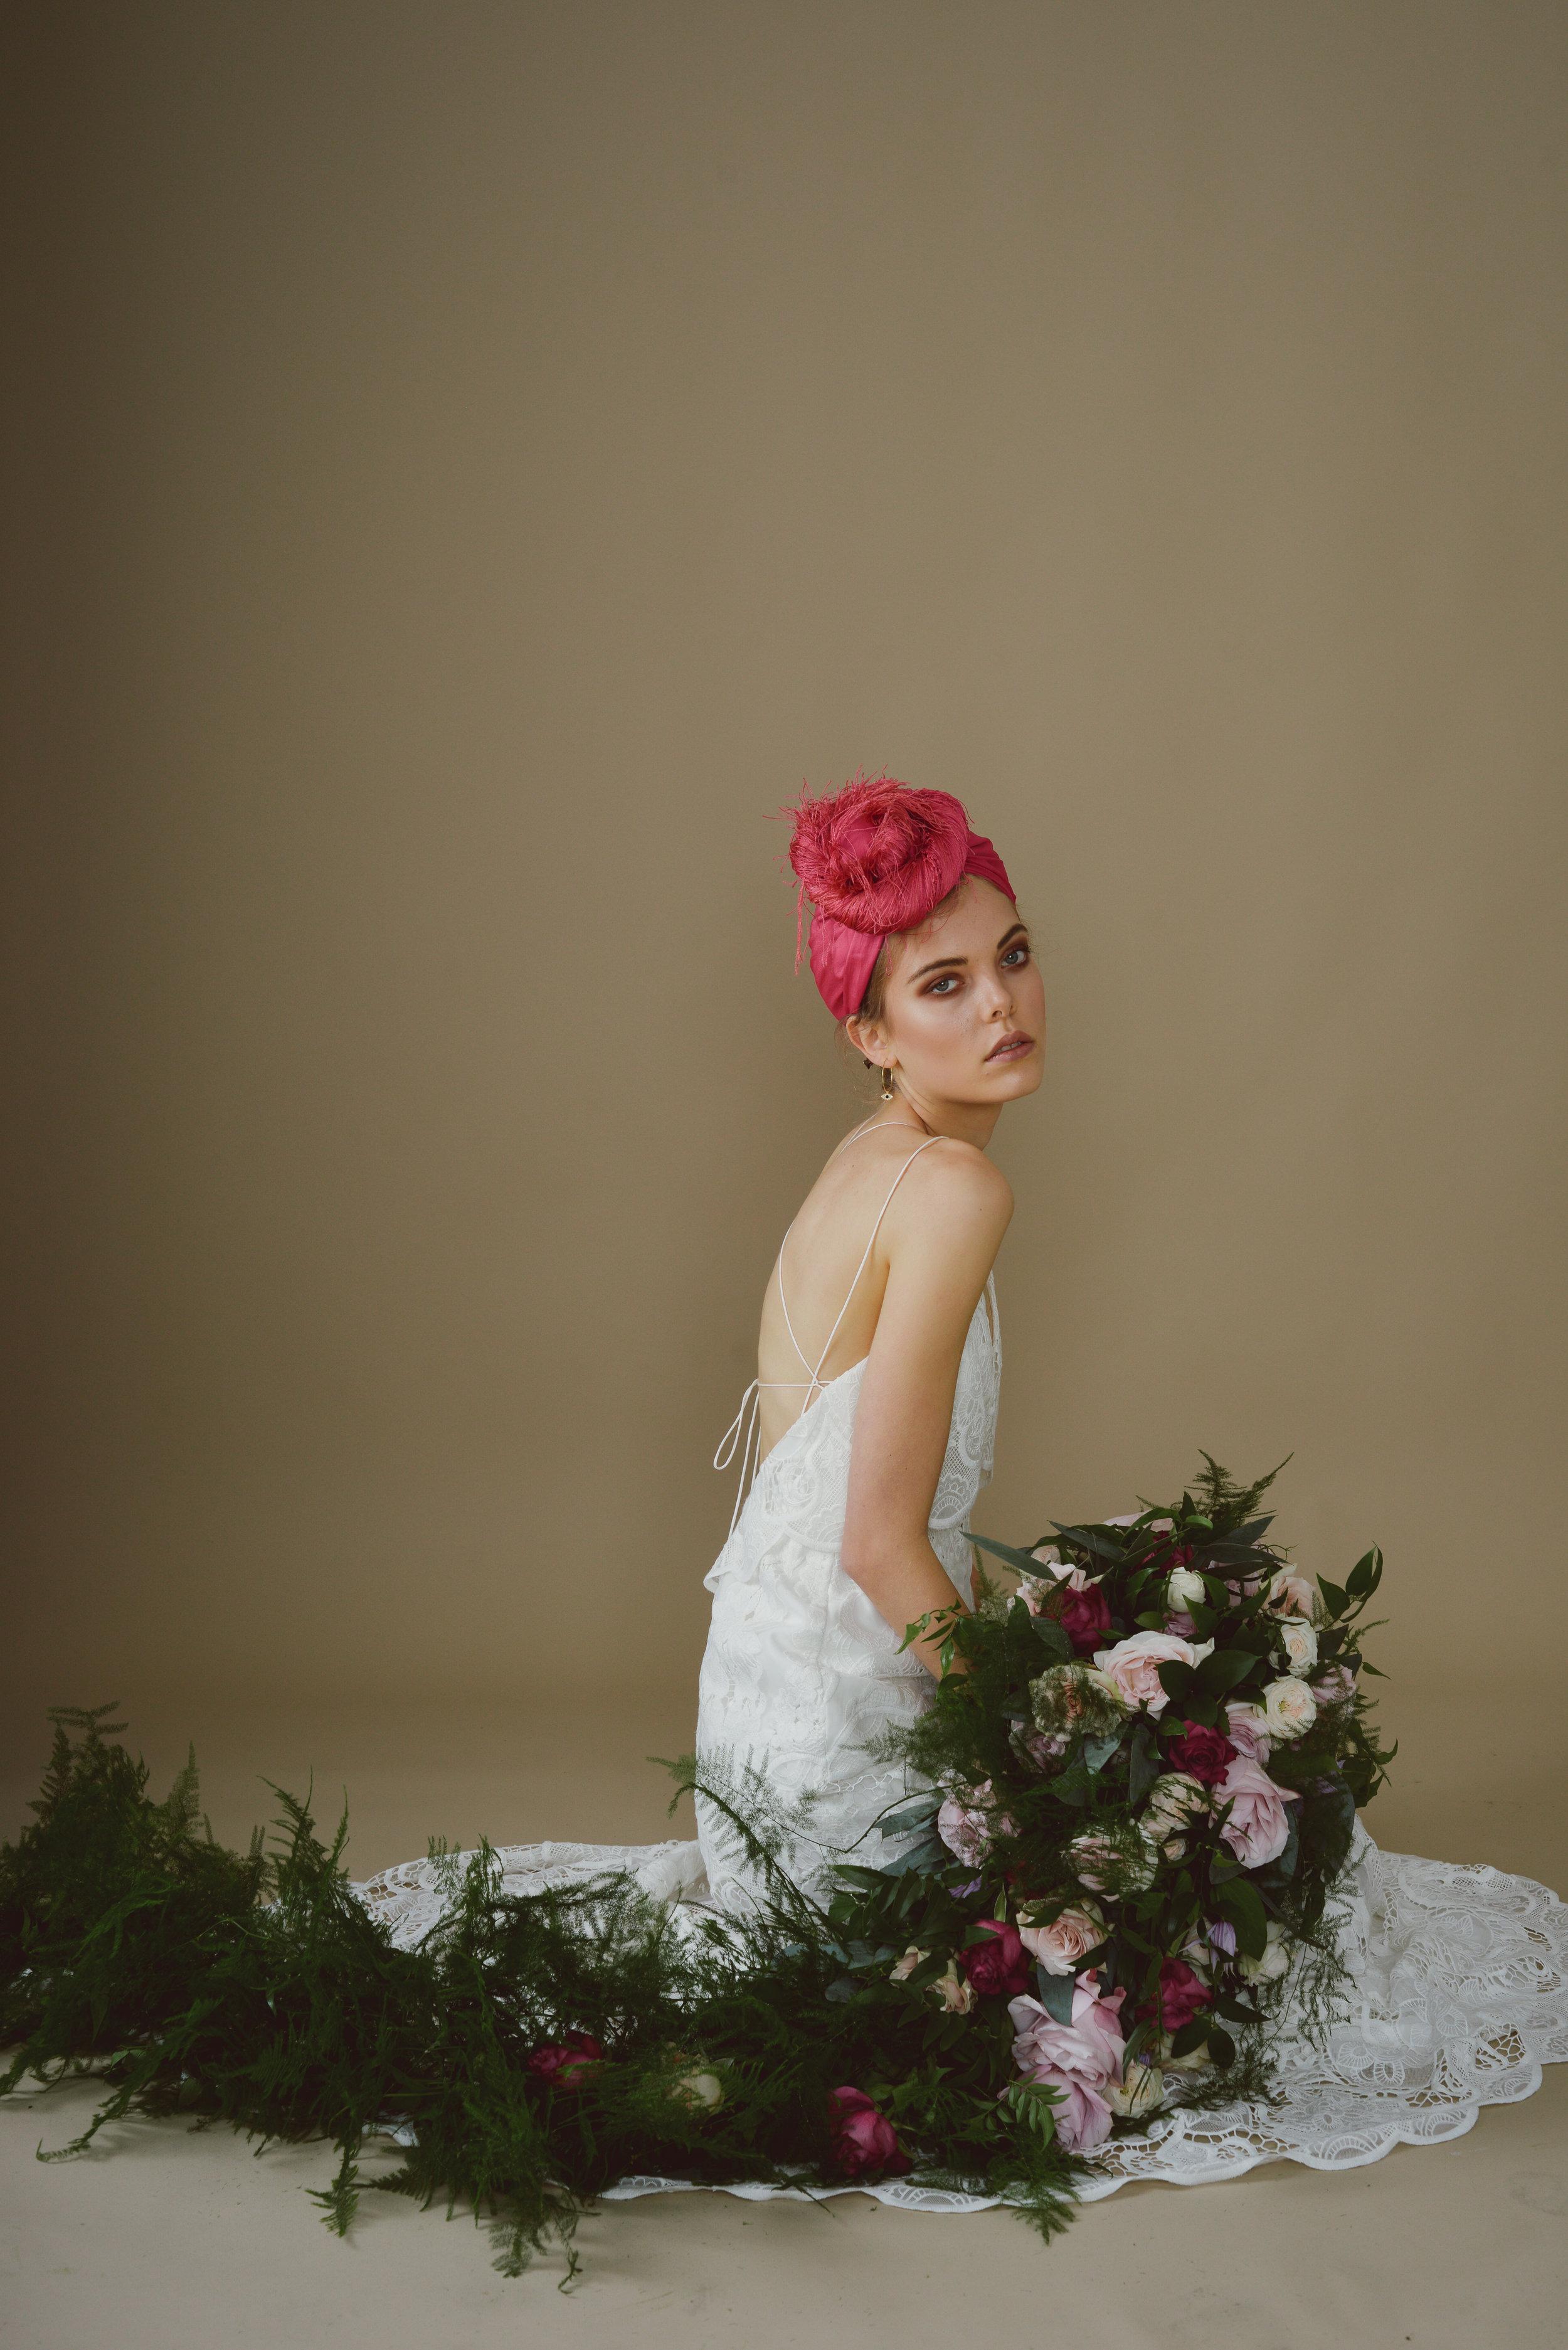 RomanticStudio_SarahBurton_22.jpg